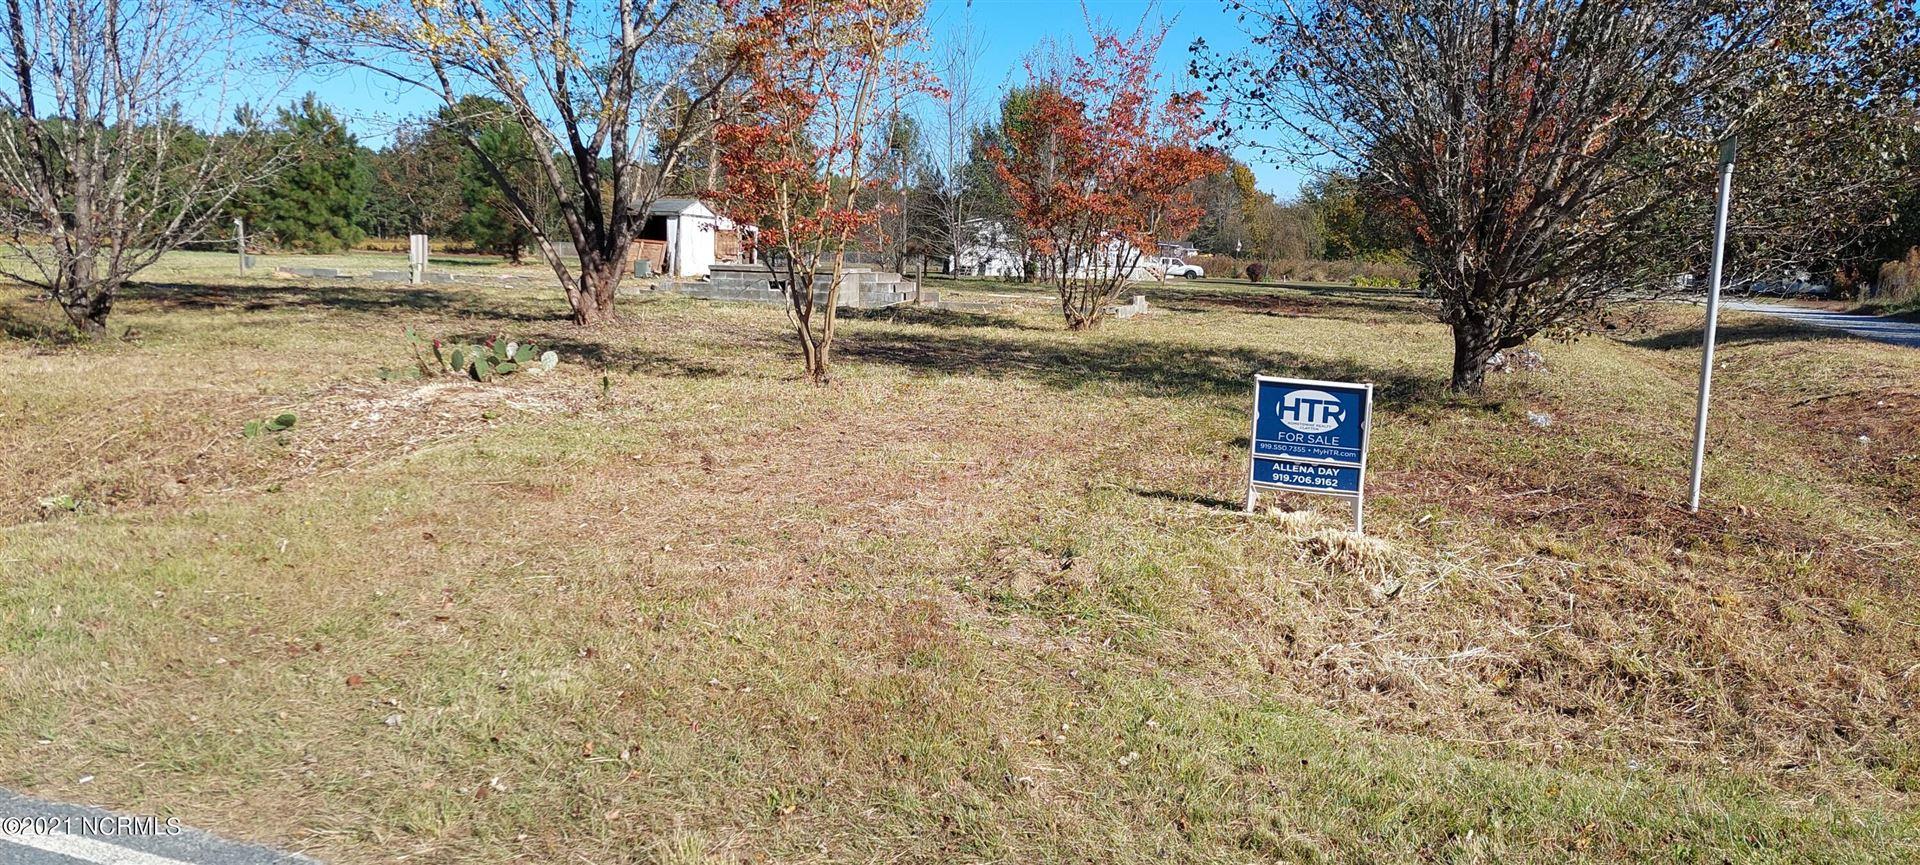 Photo of 5746 Gay Road, Farmville, NC 27828 (MLS # 100286206)